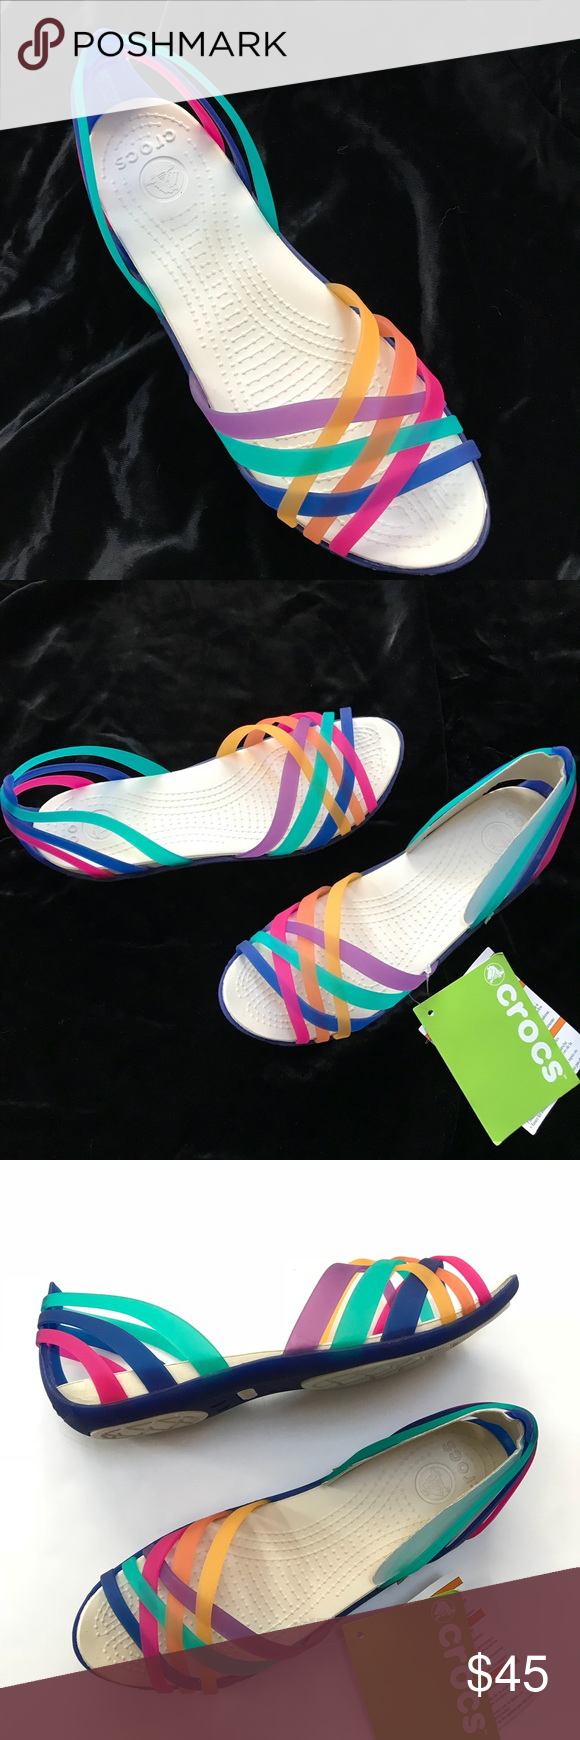 fc068f55b2749 Crocs Rainbow Huarache Flat Sandals Shoes. Size 7 Crocs Rainbow Sandals  Shoes. Women s Size